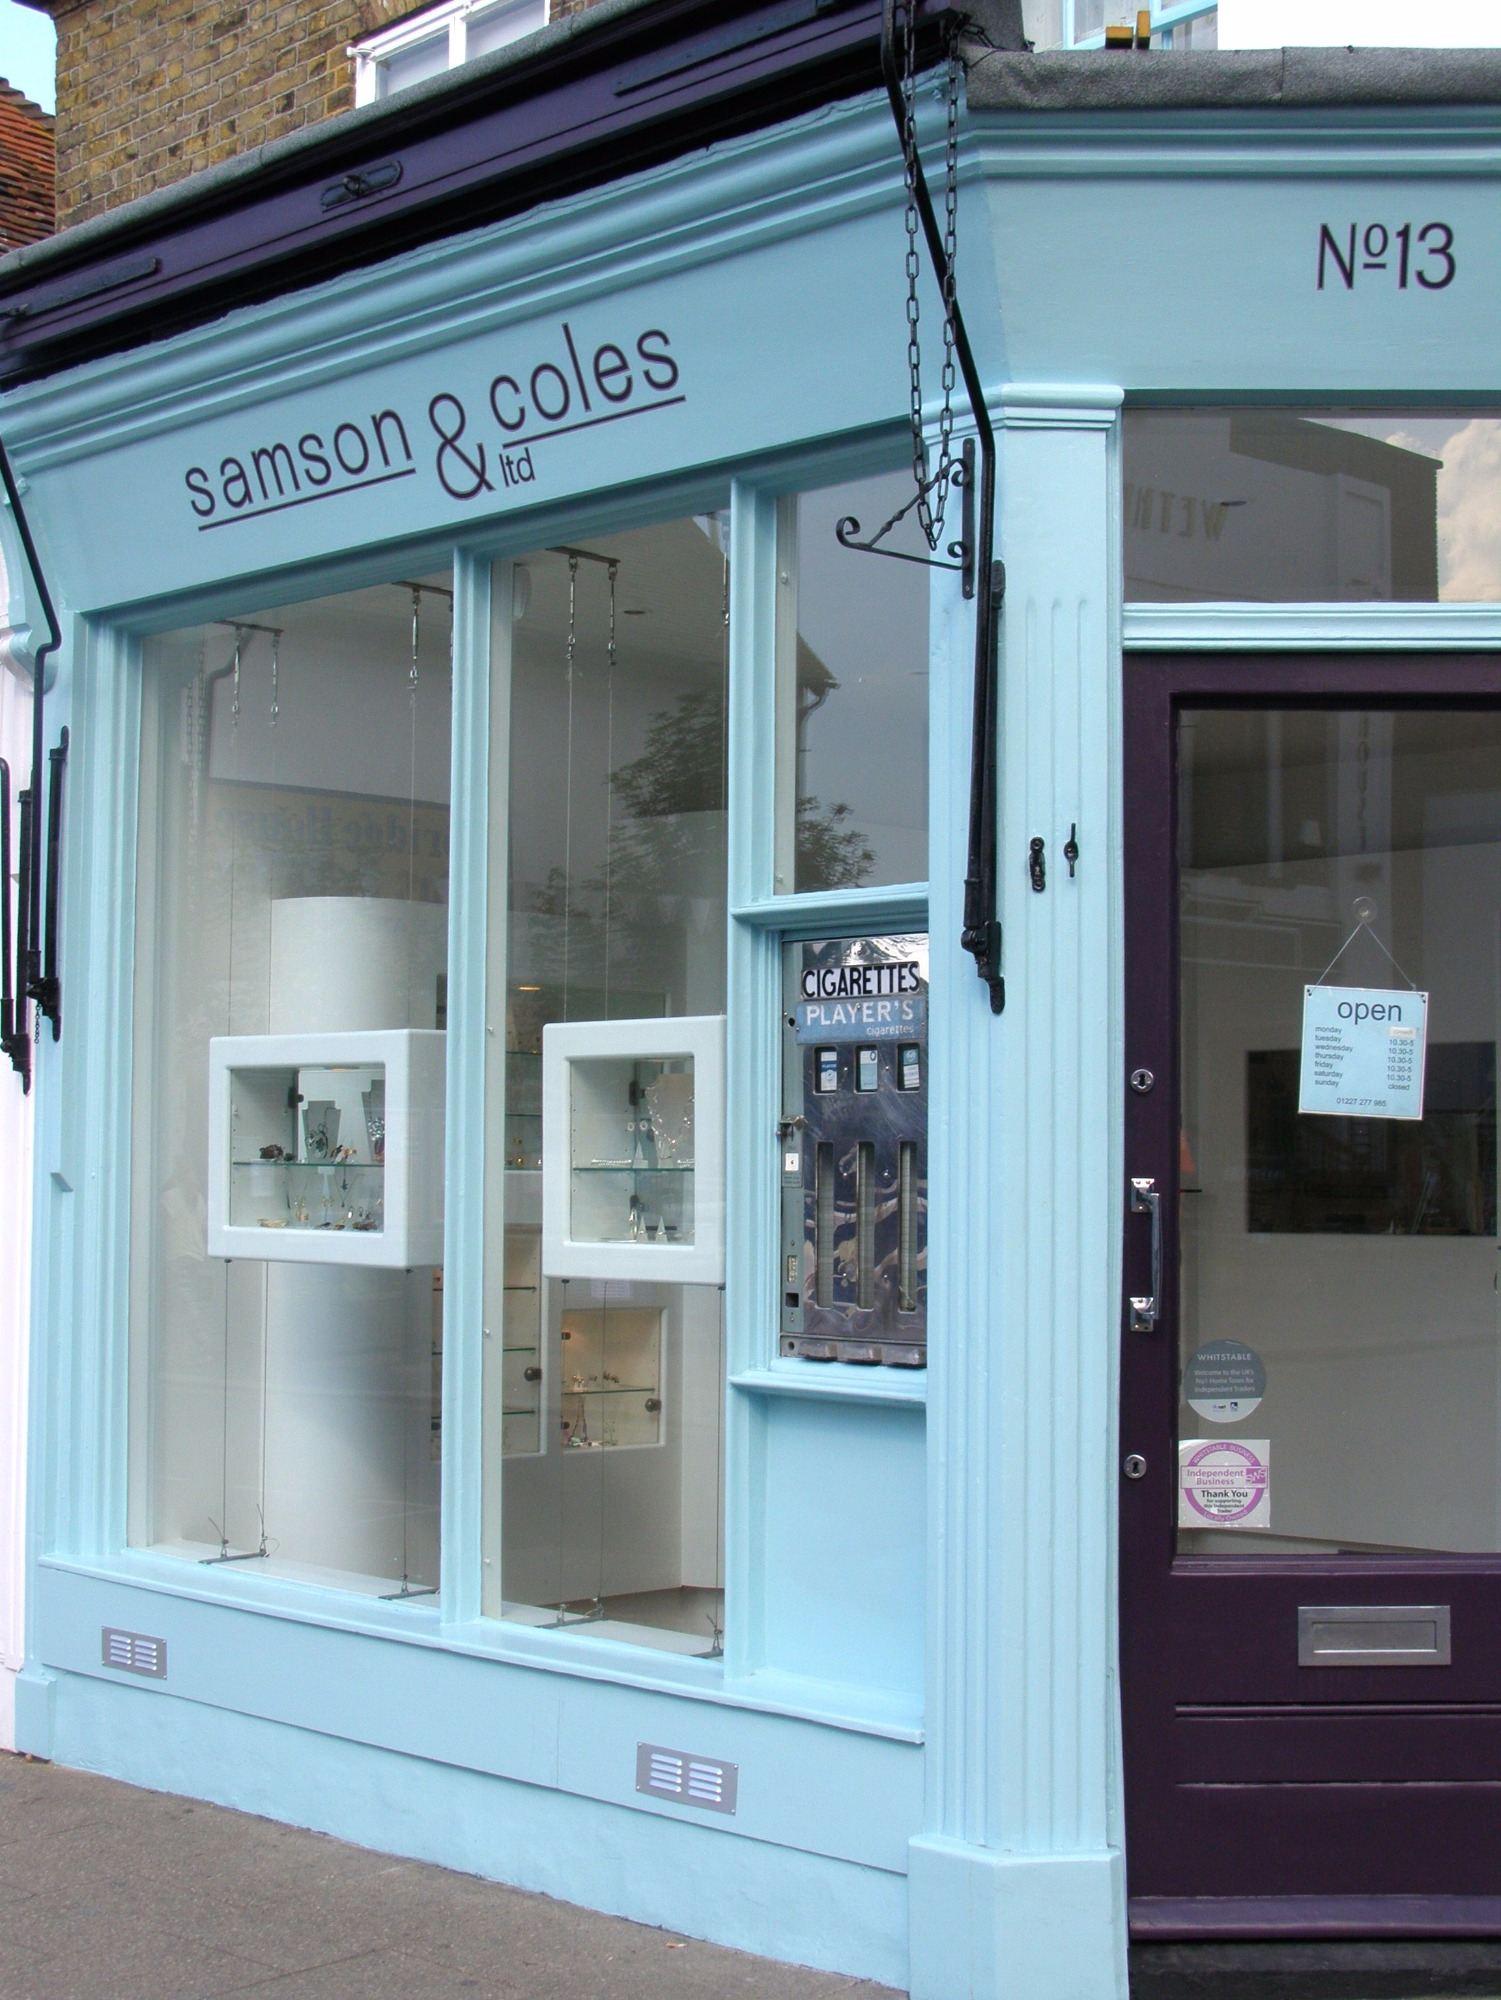 Samson and Coles Shop